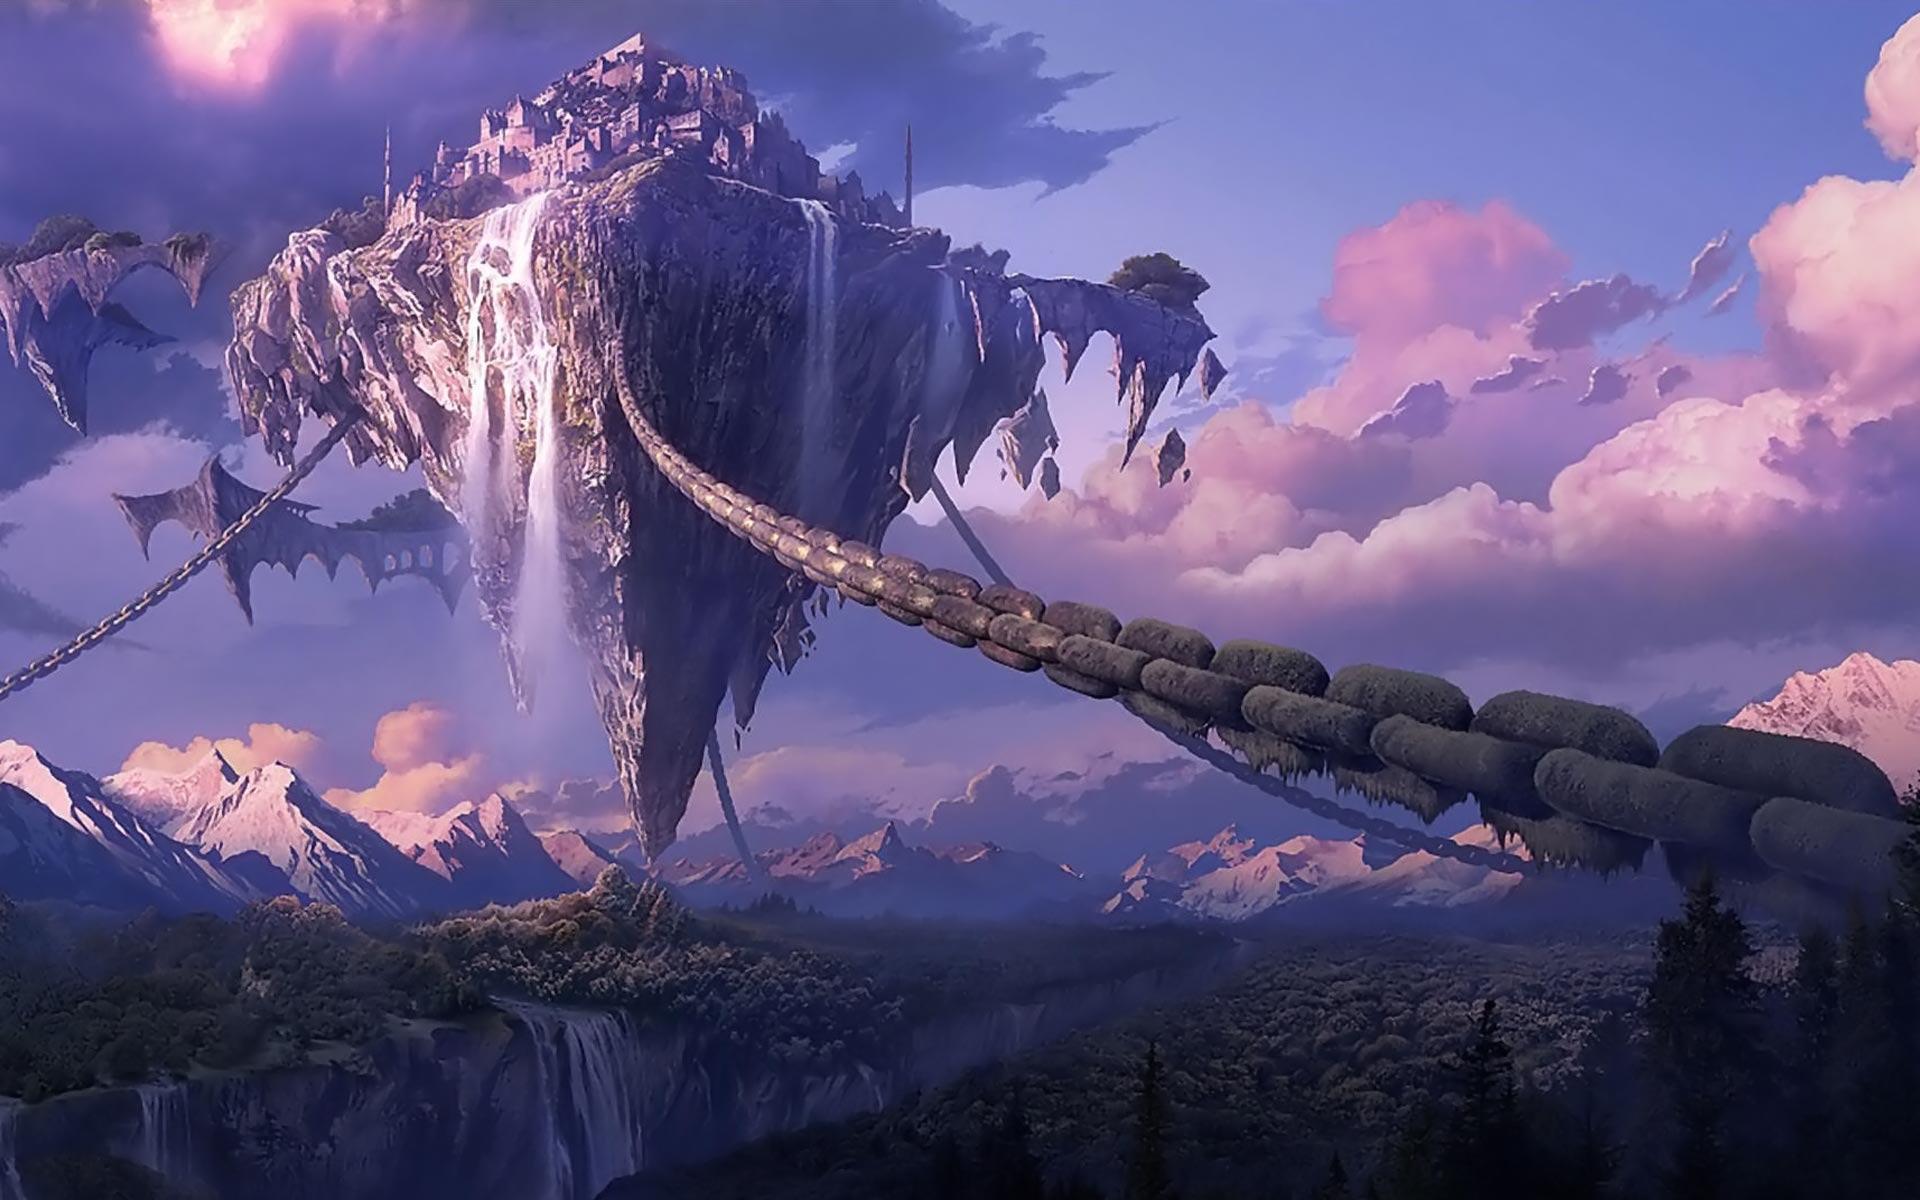 80 best D&D Inspiration images on Pinterest | Fantasy places, Fantasy  landscape and Landscapes